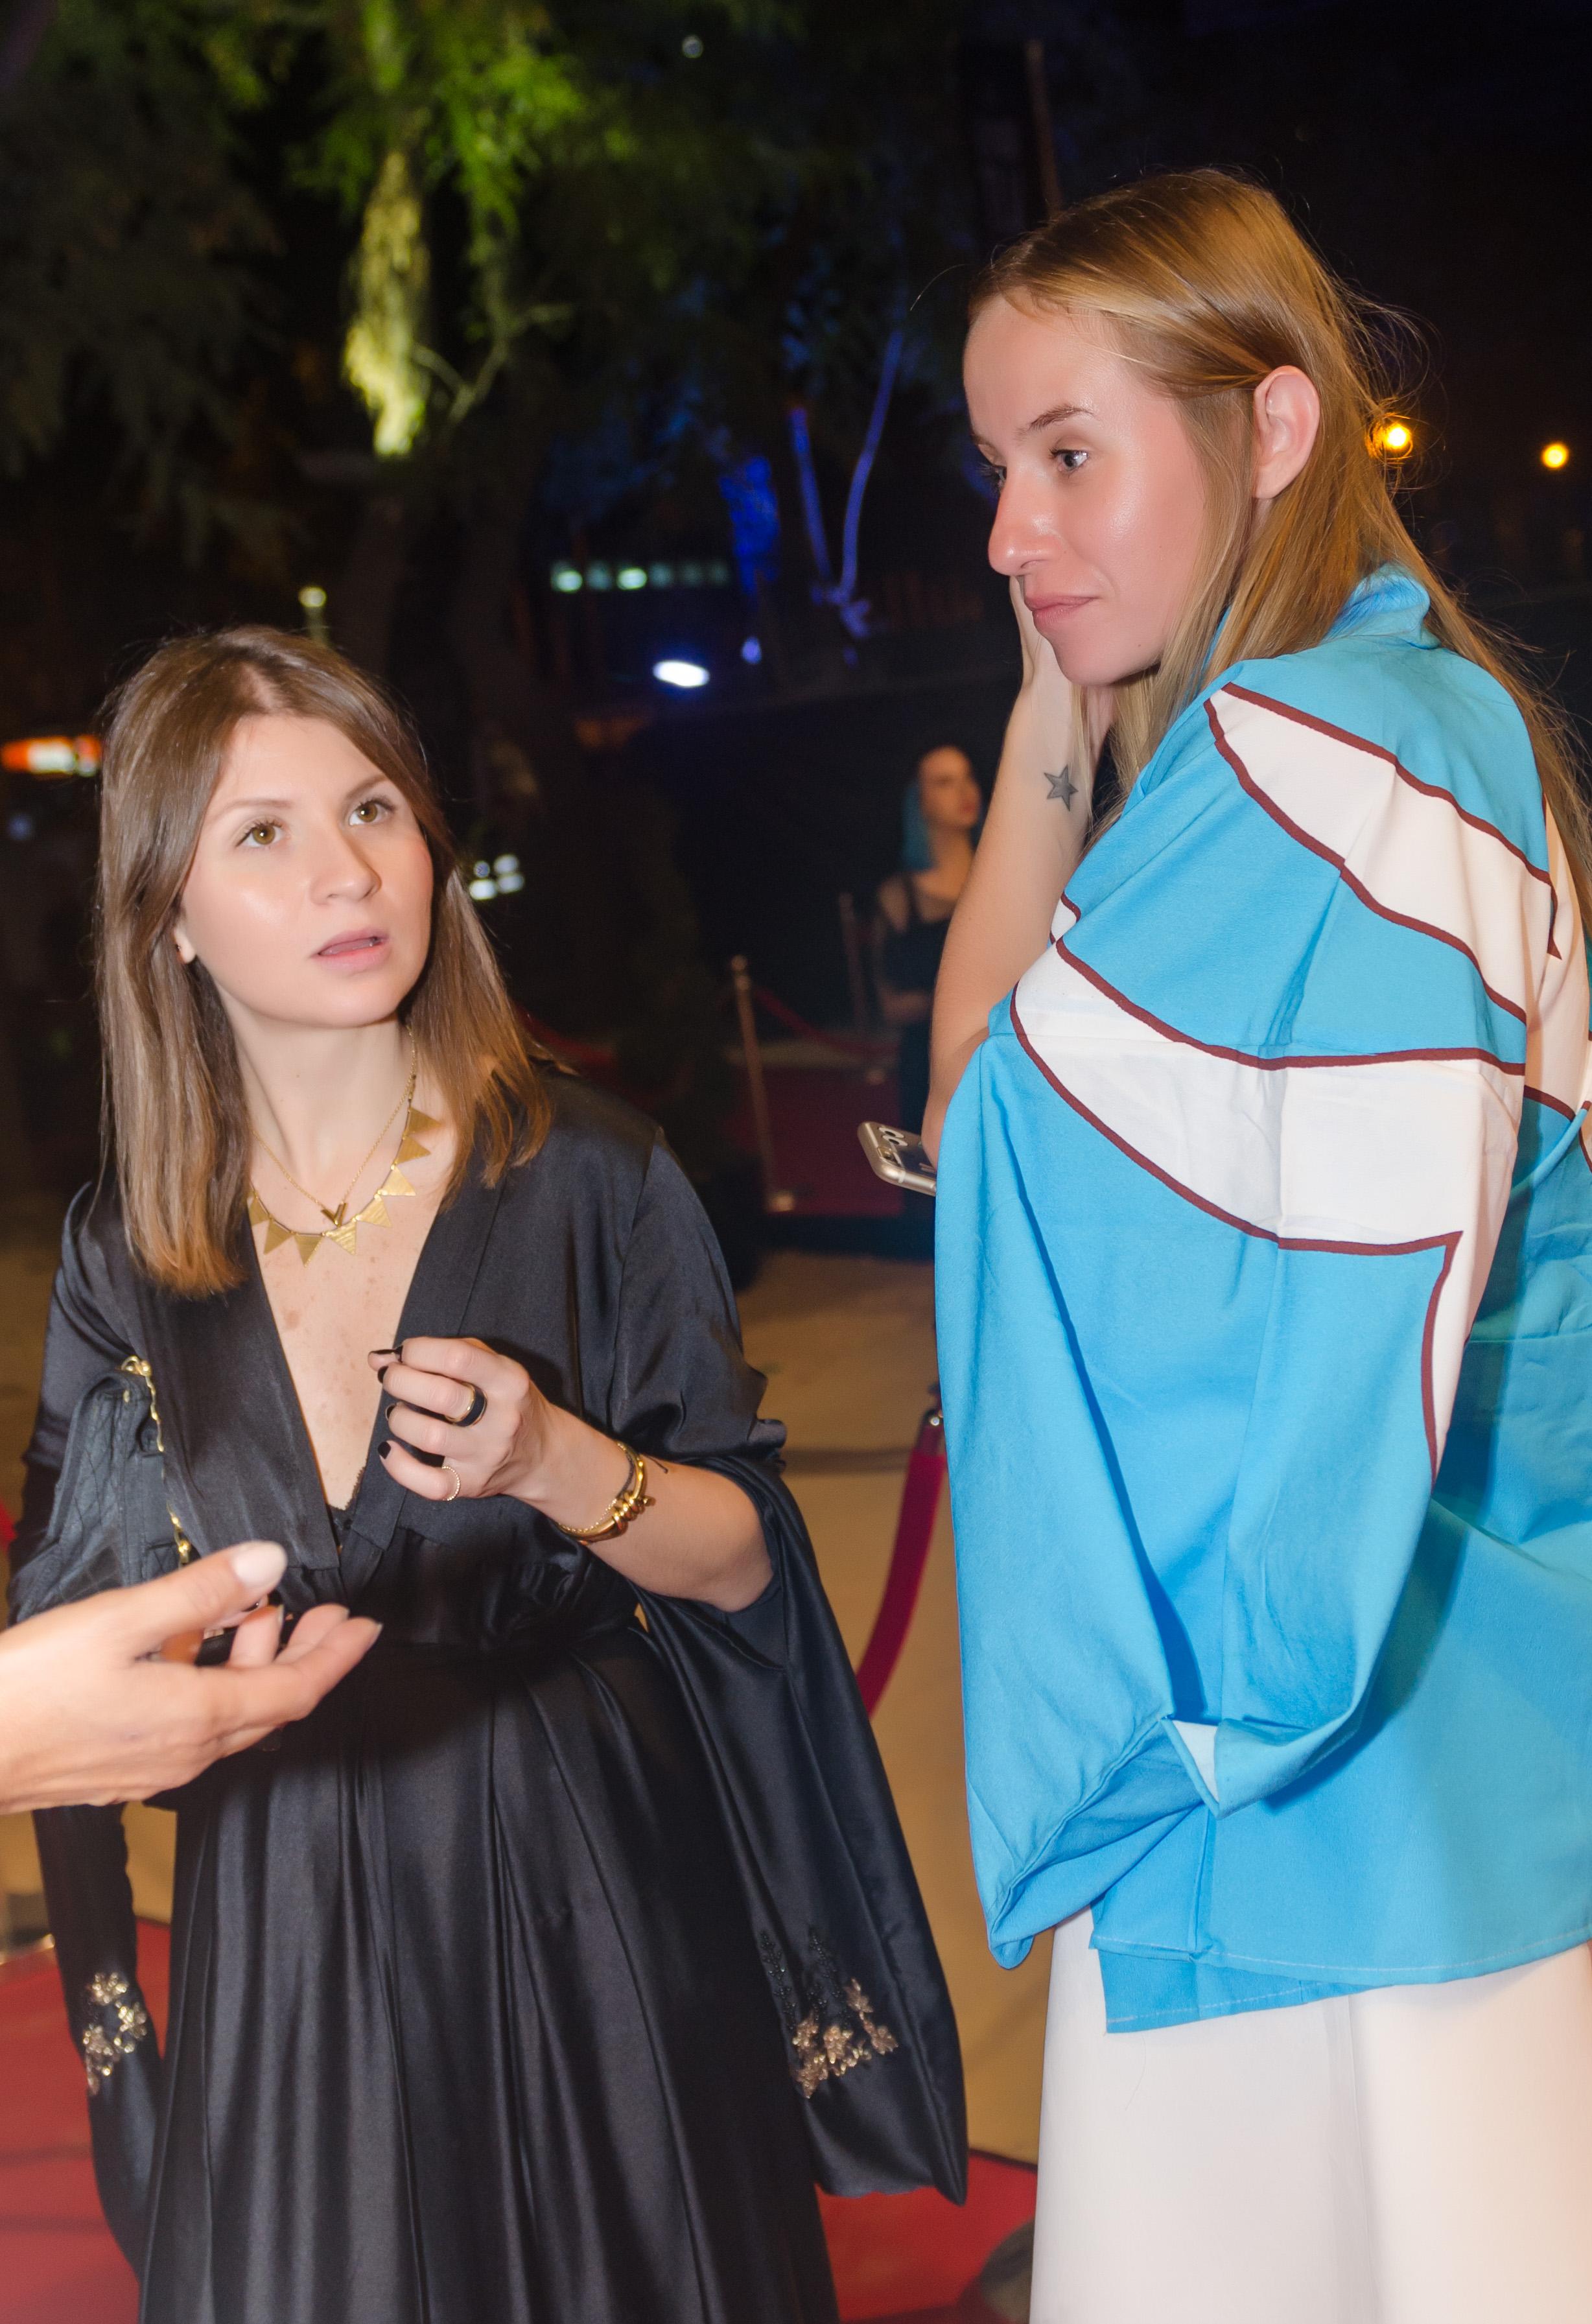 Shiran Mania (מאניה שירן) with Nastya Lisansky